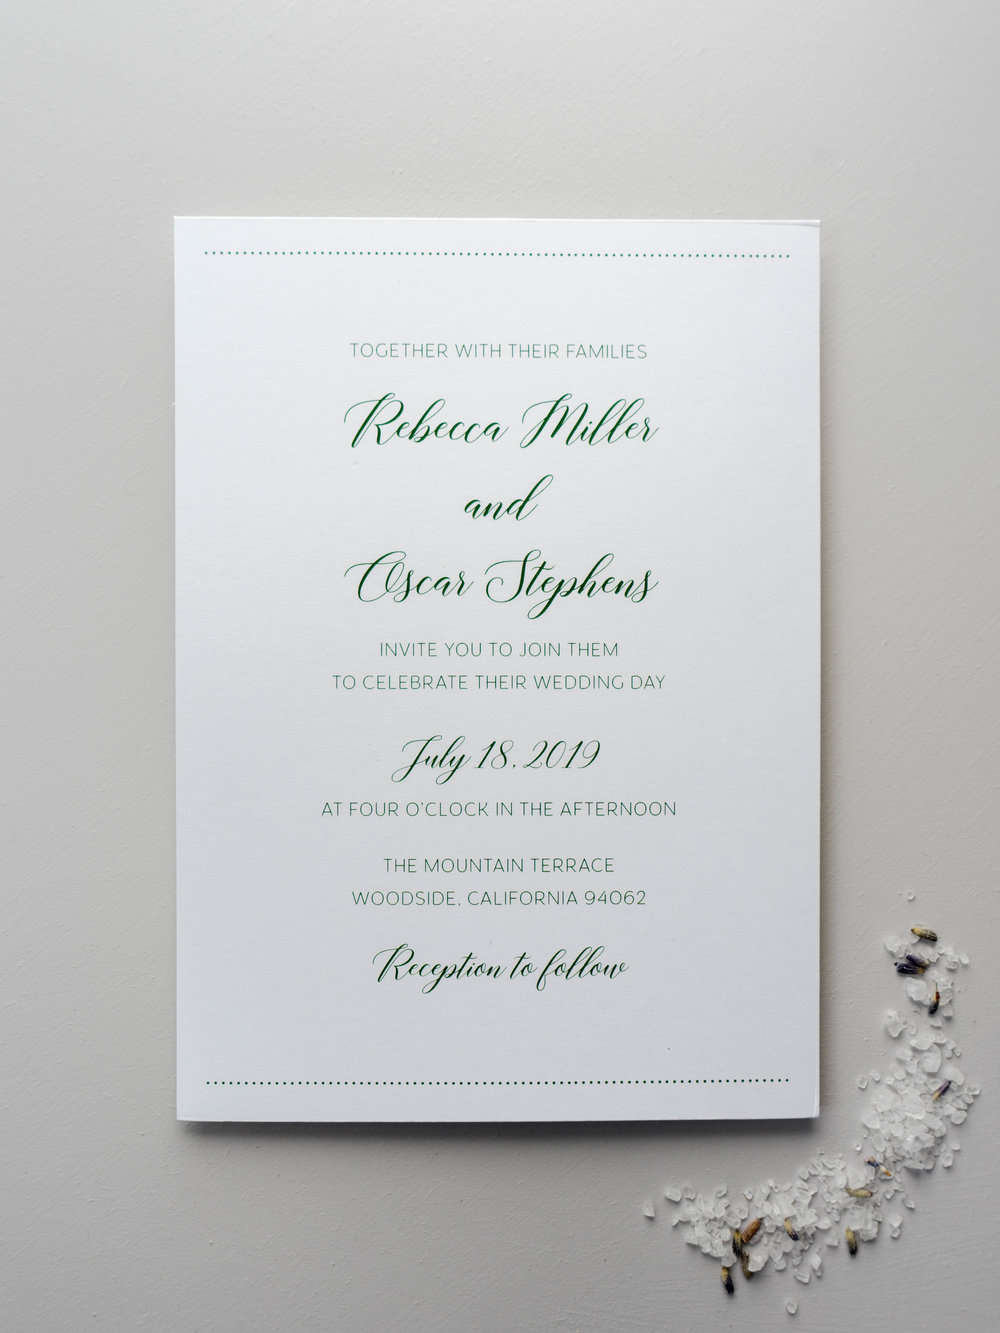 Simple Green Wedding Invitation by Just Jurf-01376.jpg